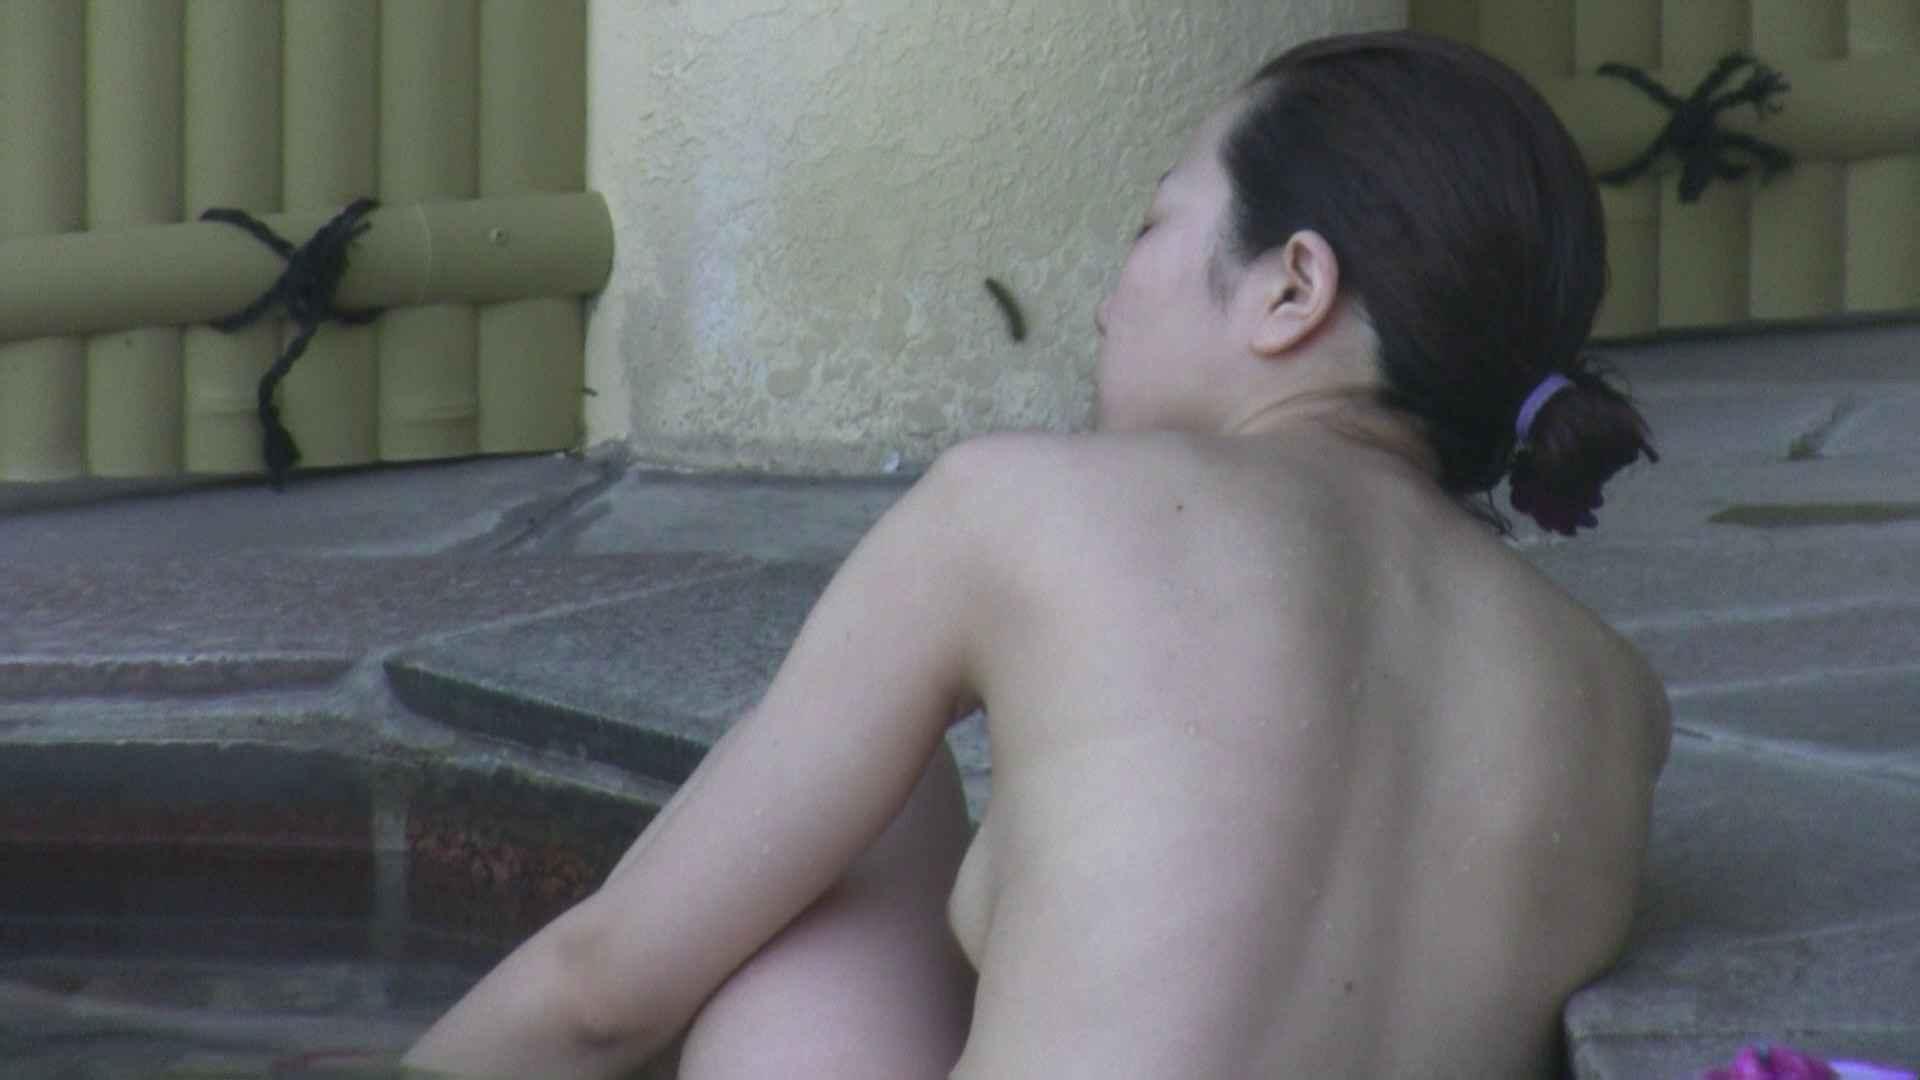 Aquaな露天風呂Vol.88【VIP限定】 OLのエロ生活 | 露天風呂  61連発 55